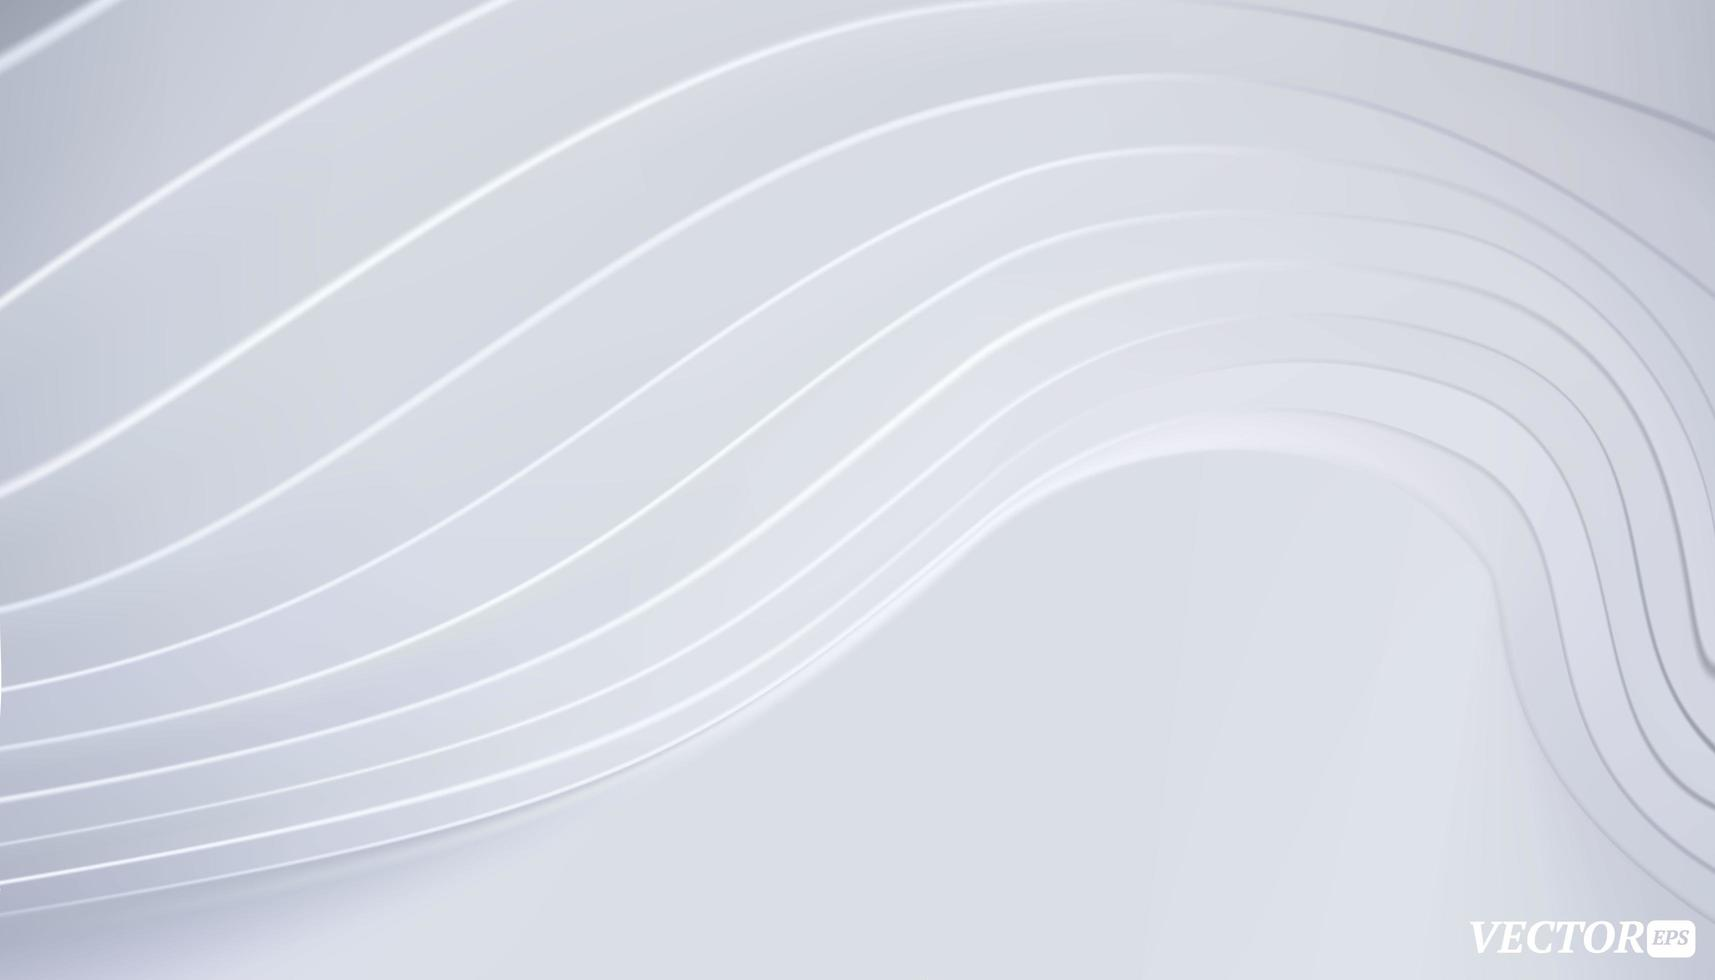 design exterior mínimo abstrato. textura de onda limpa e moderna para o conceito de slide de negócios. vetor